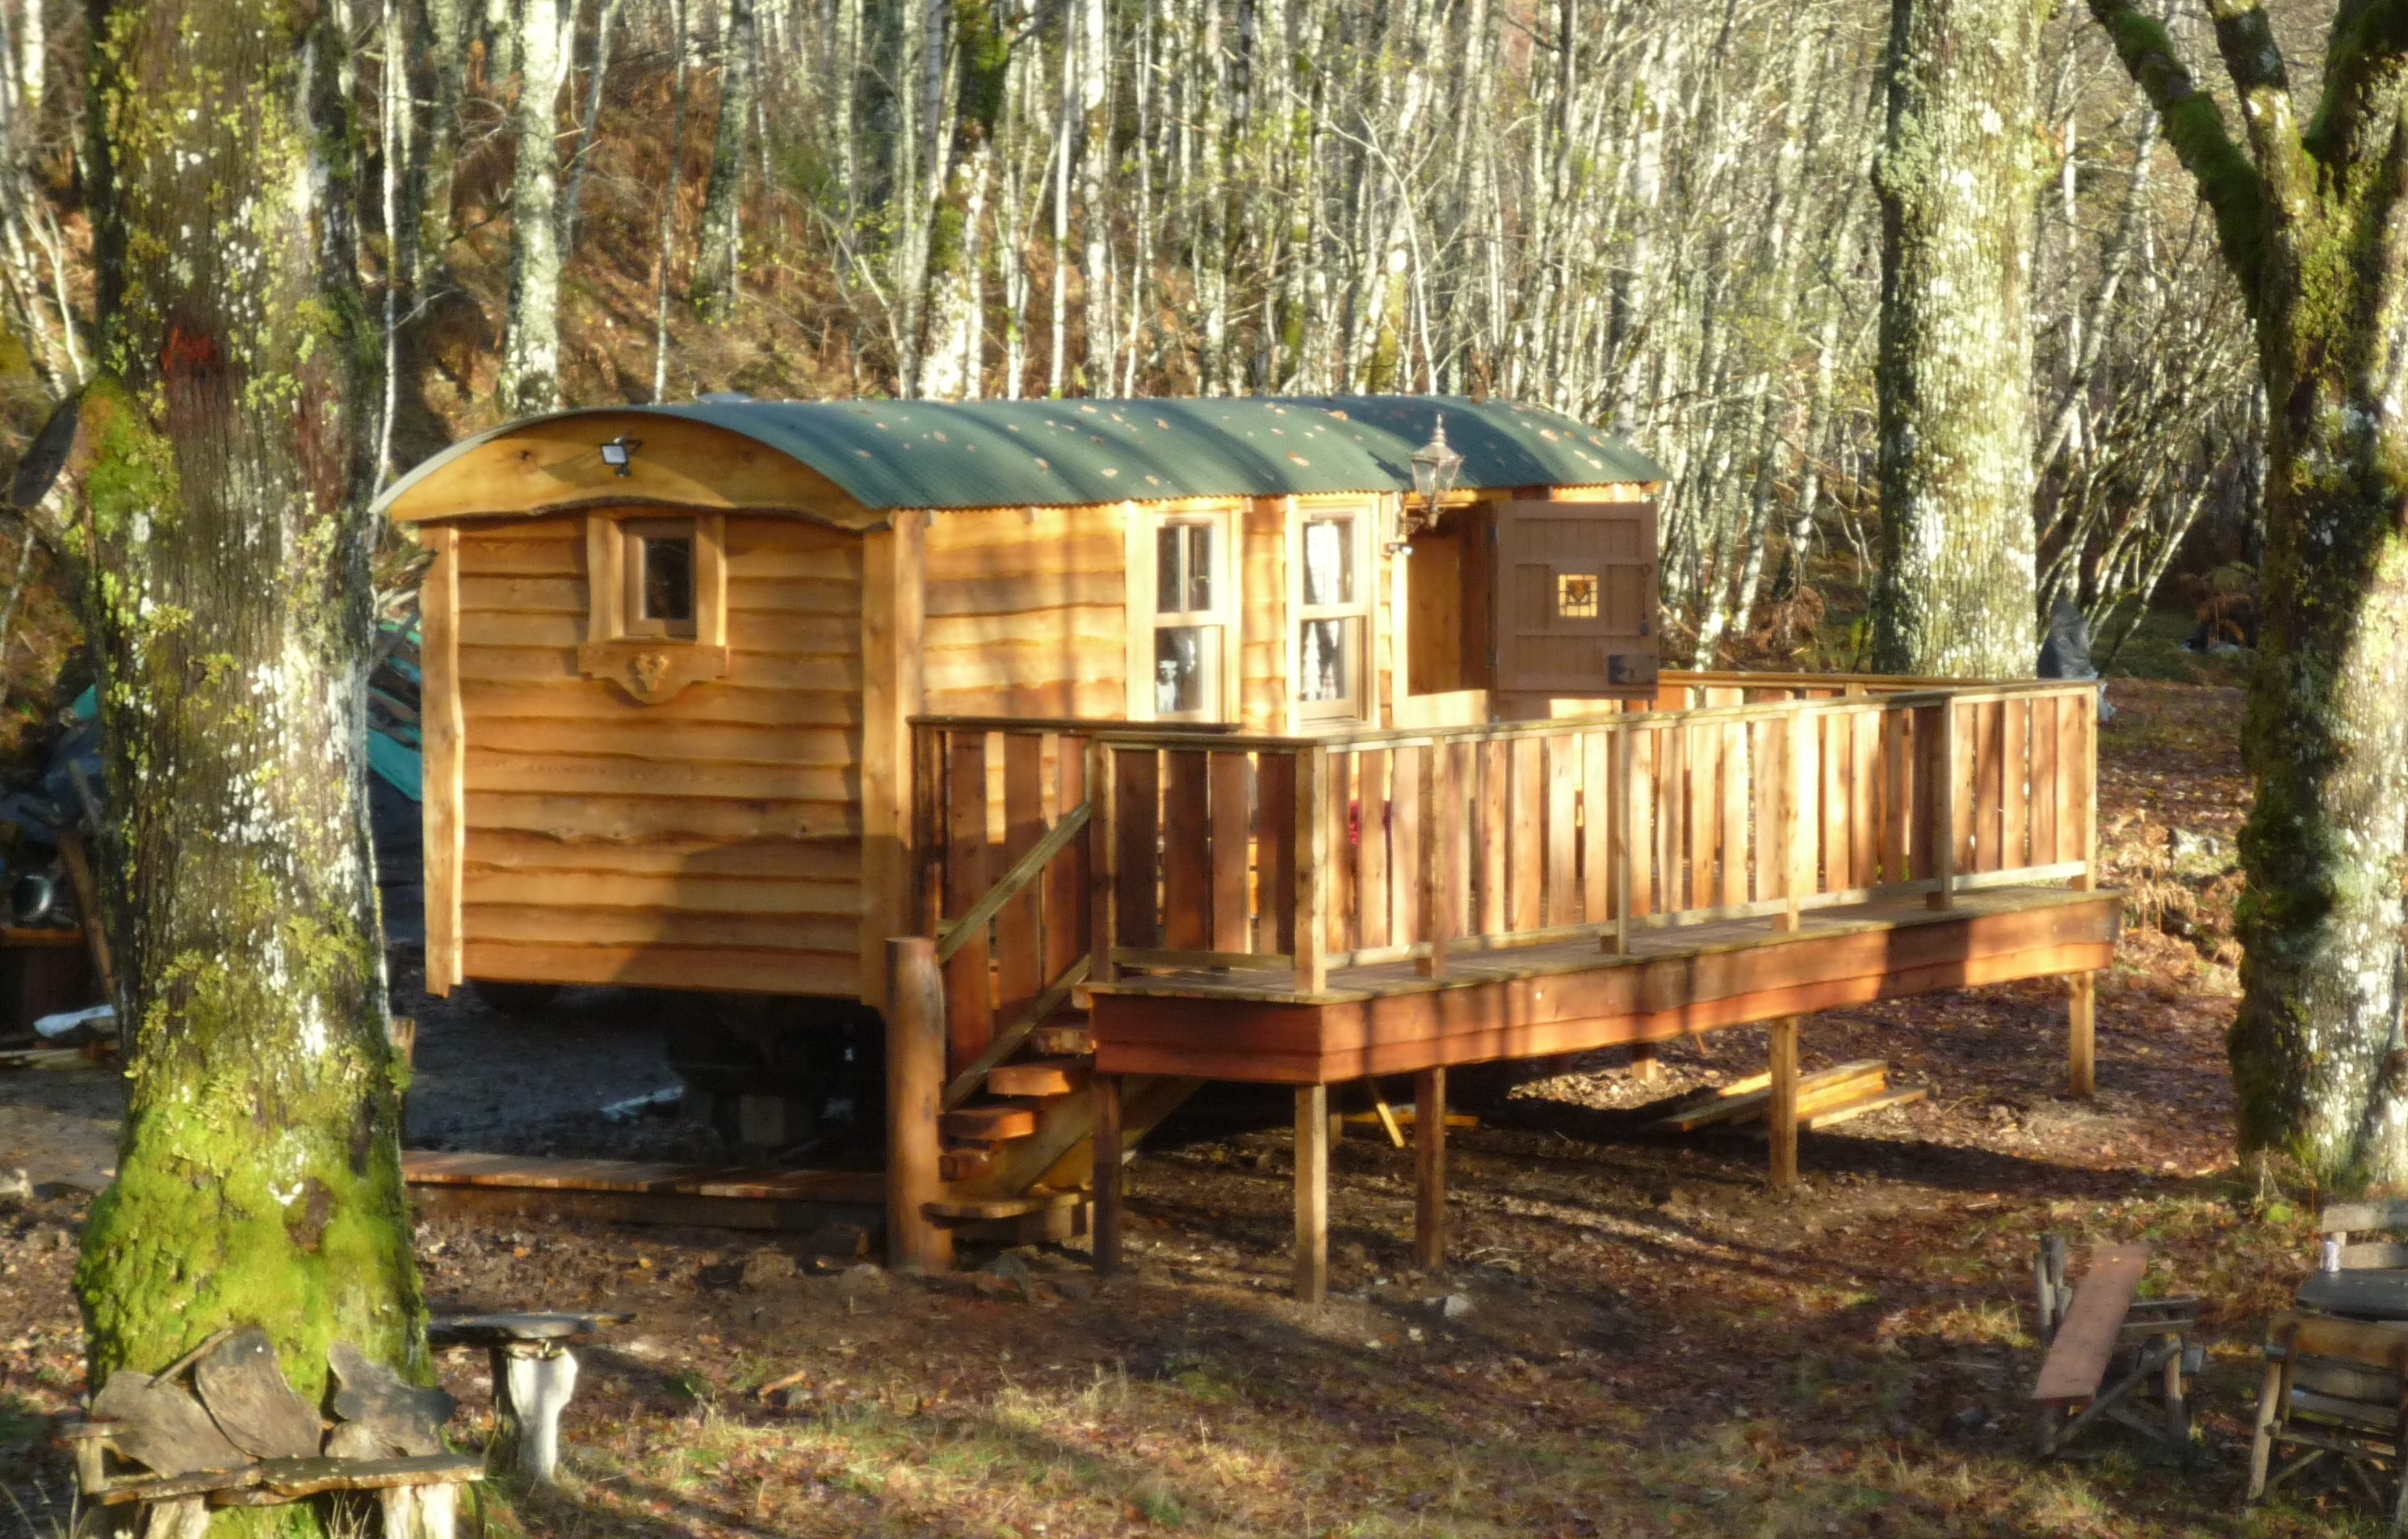 caledonian shepherds hut